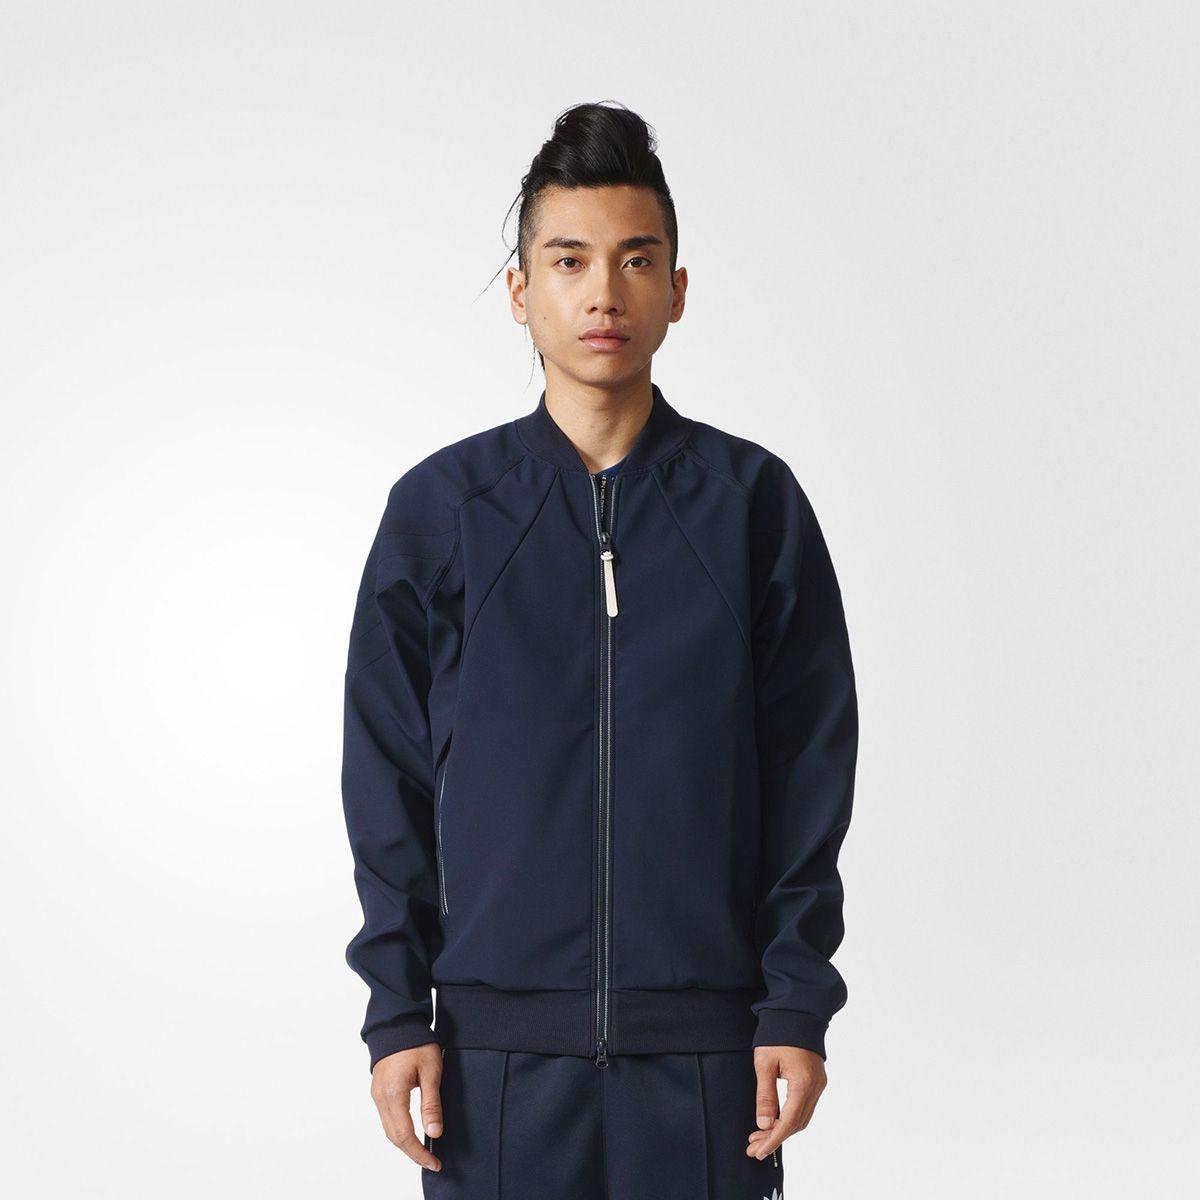 eb46e56e8c9d8 Type Jackets adidas Originals NMD Tracktop Jacket